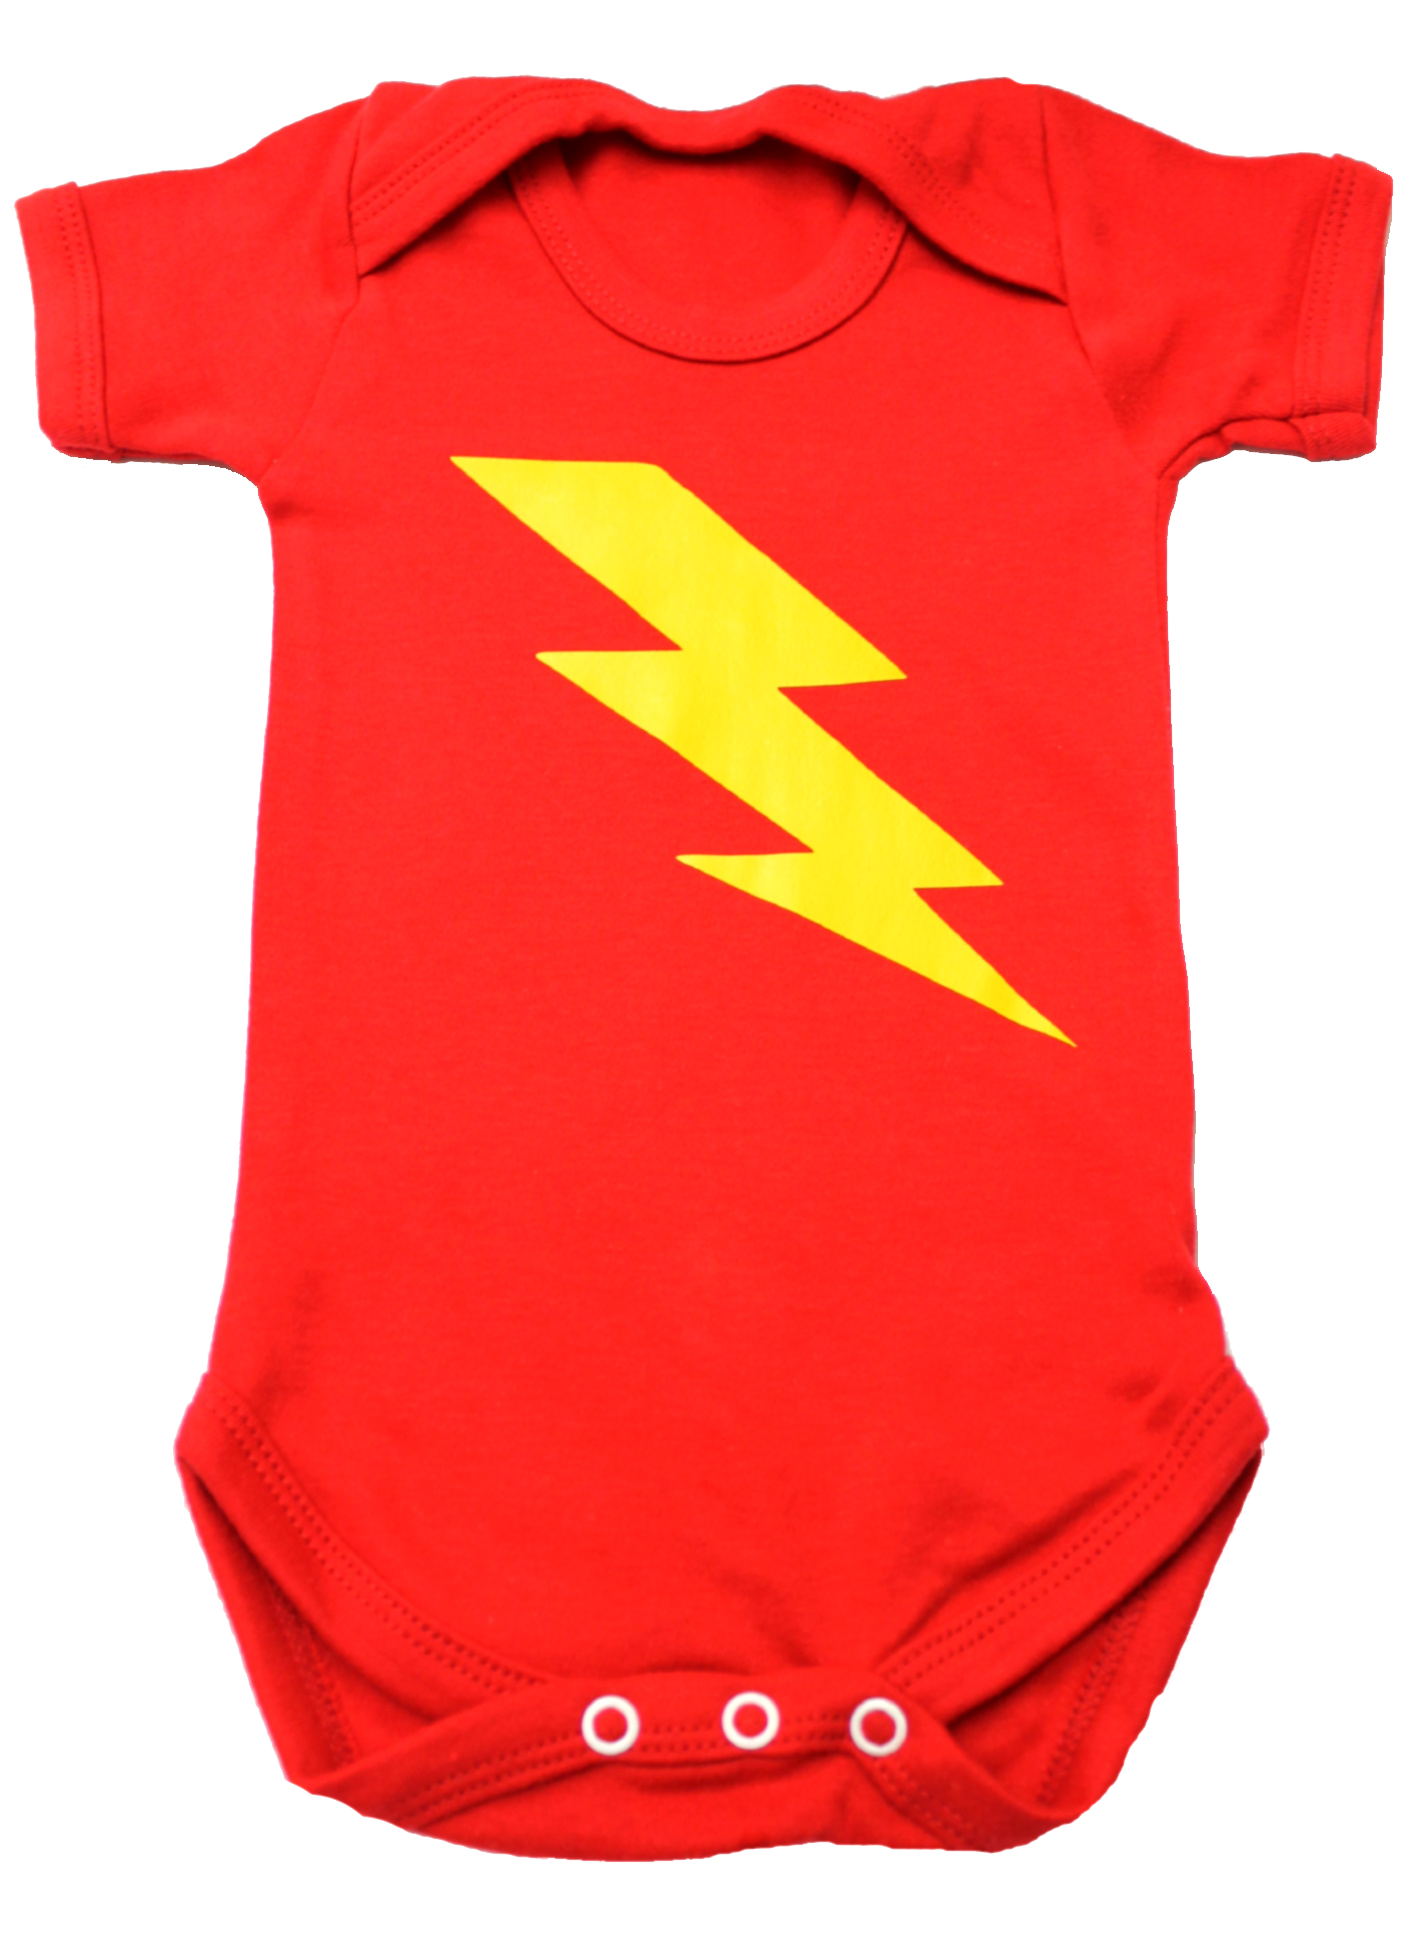 Baby Vest PNG Transparent Baby Vest.PNG Images. | PlusPNG